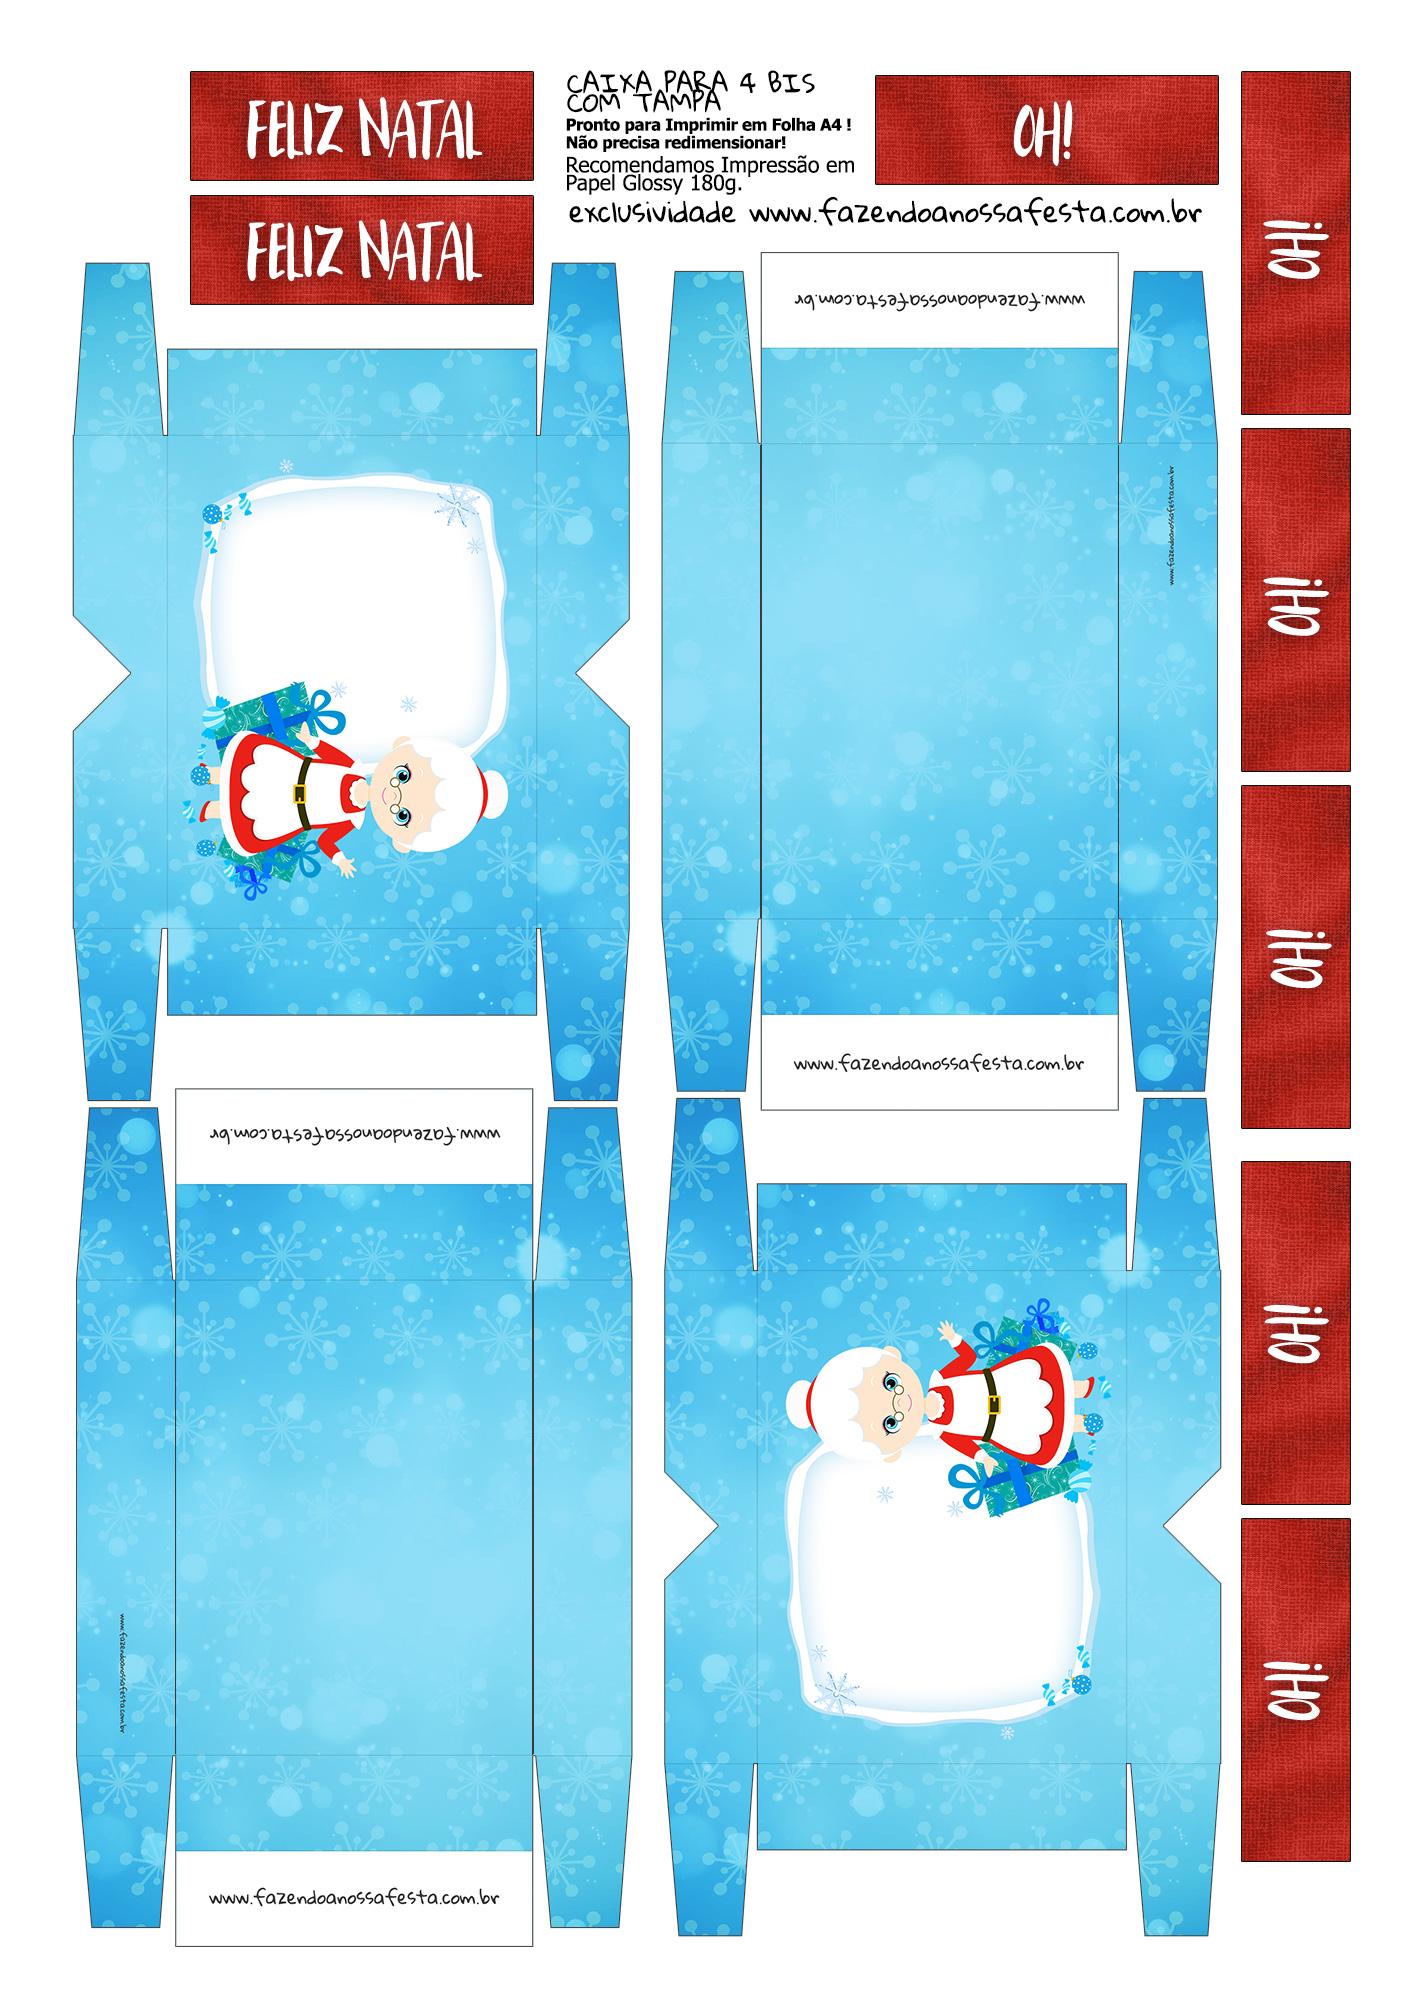 Lembrancinha para Natal Caixa 4 Bis 5